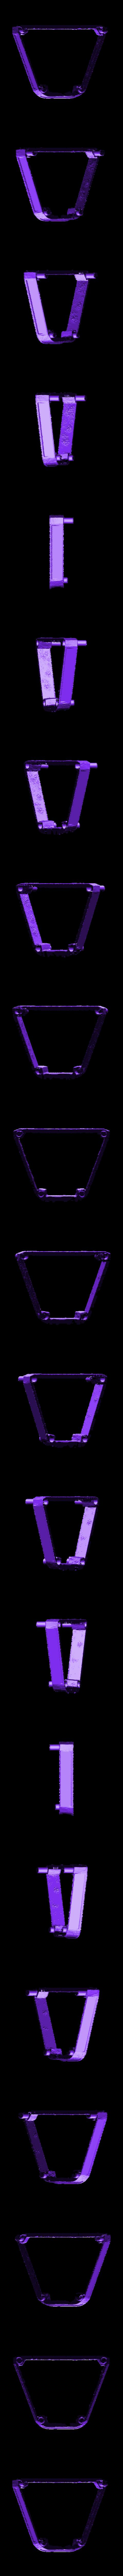 skull-mid-fix.stl Download free STL file LED Skull Lantern • Model to 3D print, Adafruit